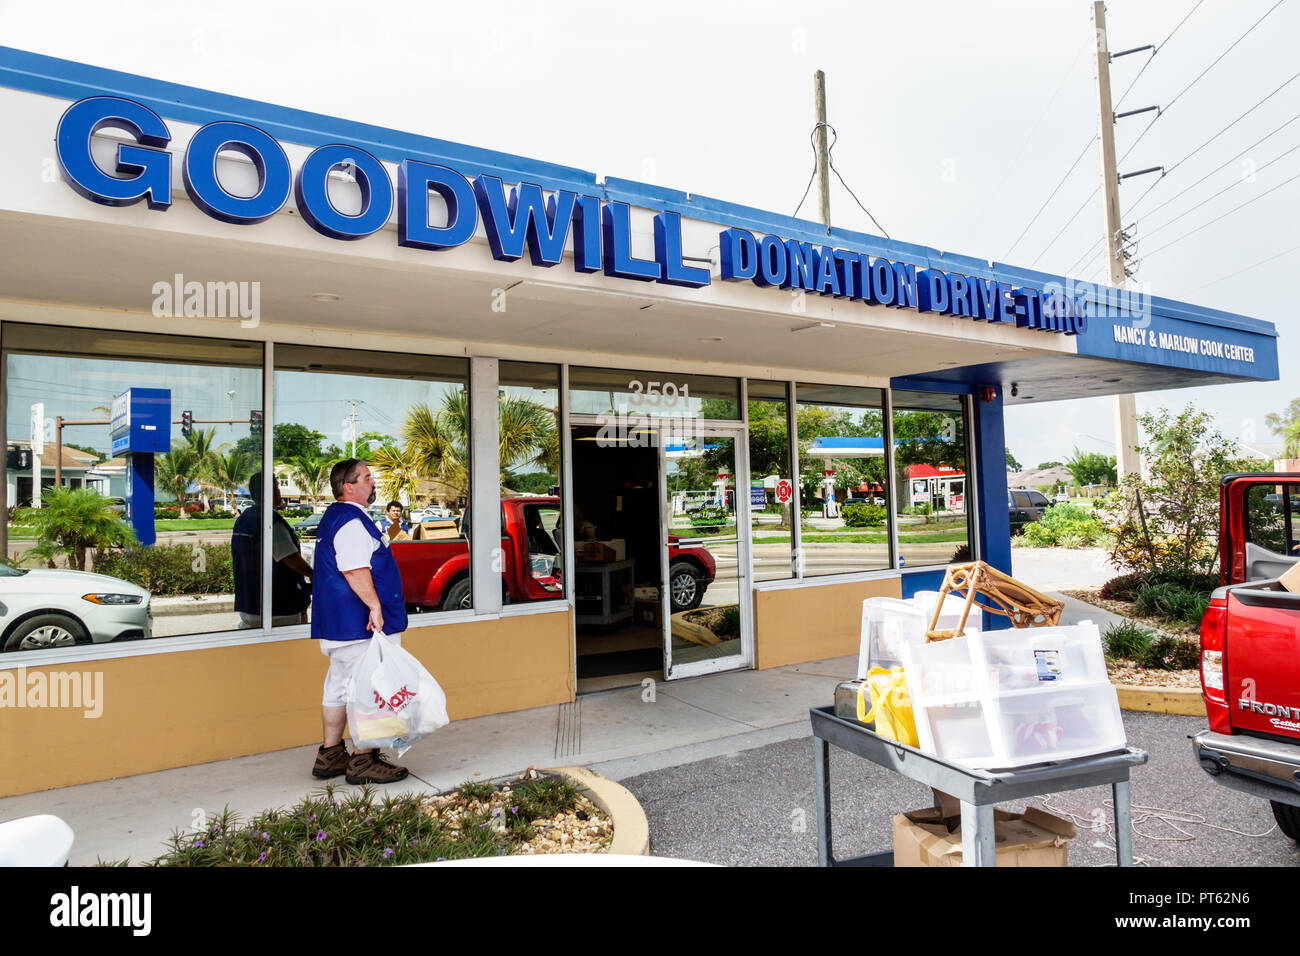 Sarasota Florida Goodwill Donation Drive-Thru front entrance - Stock Image